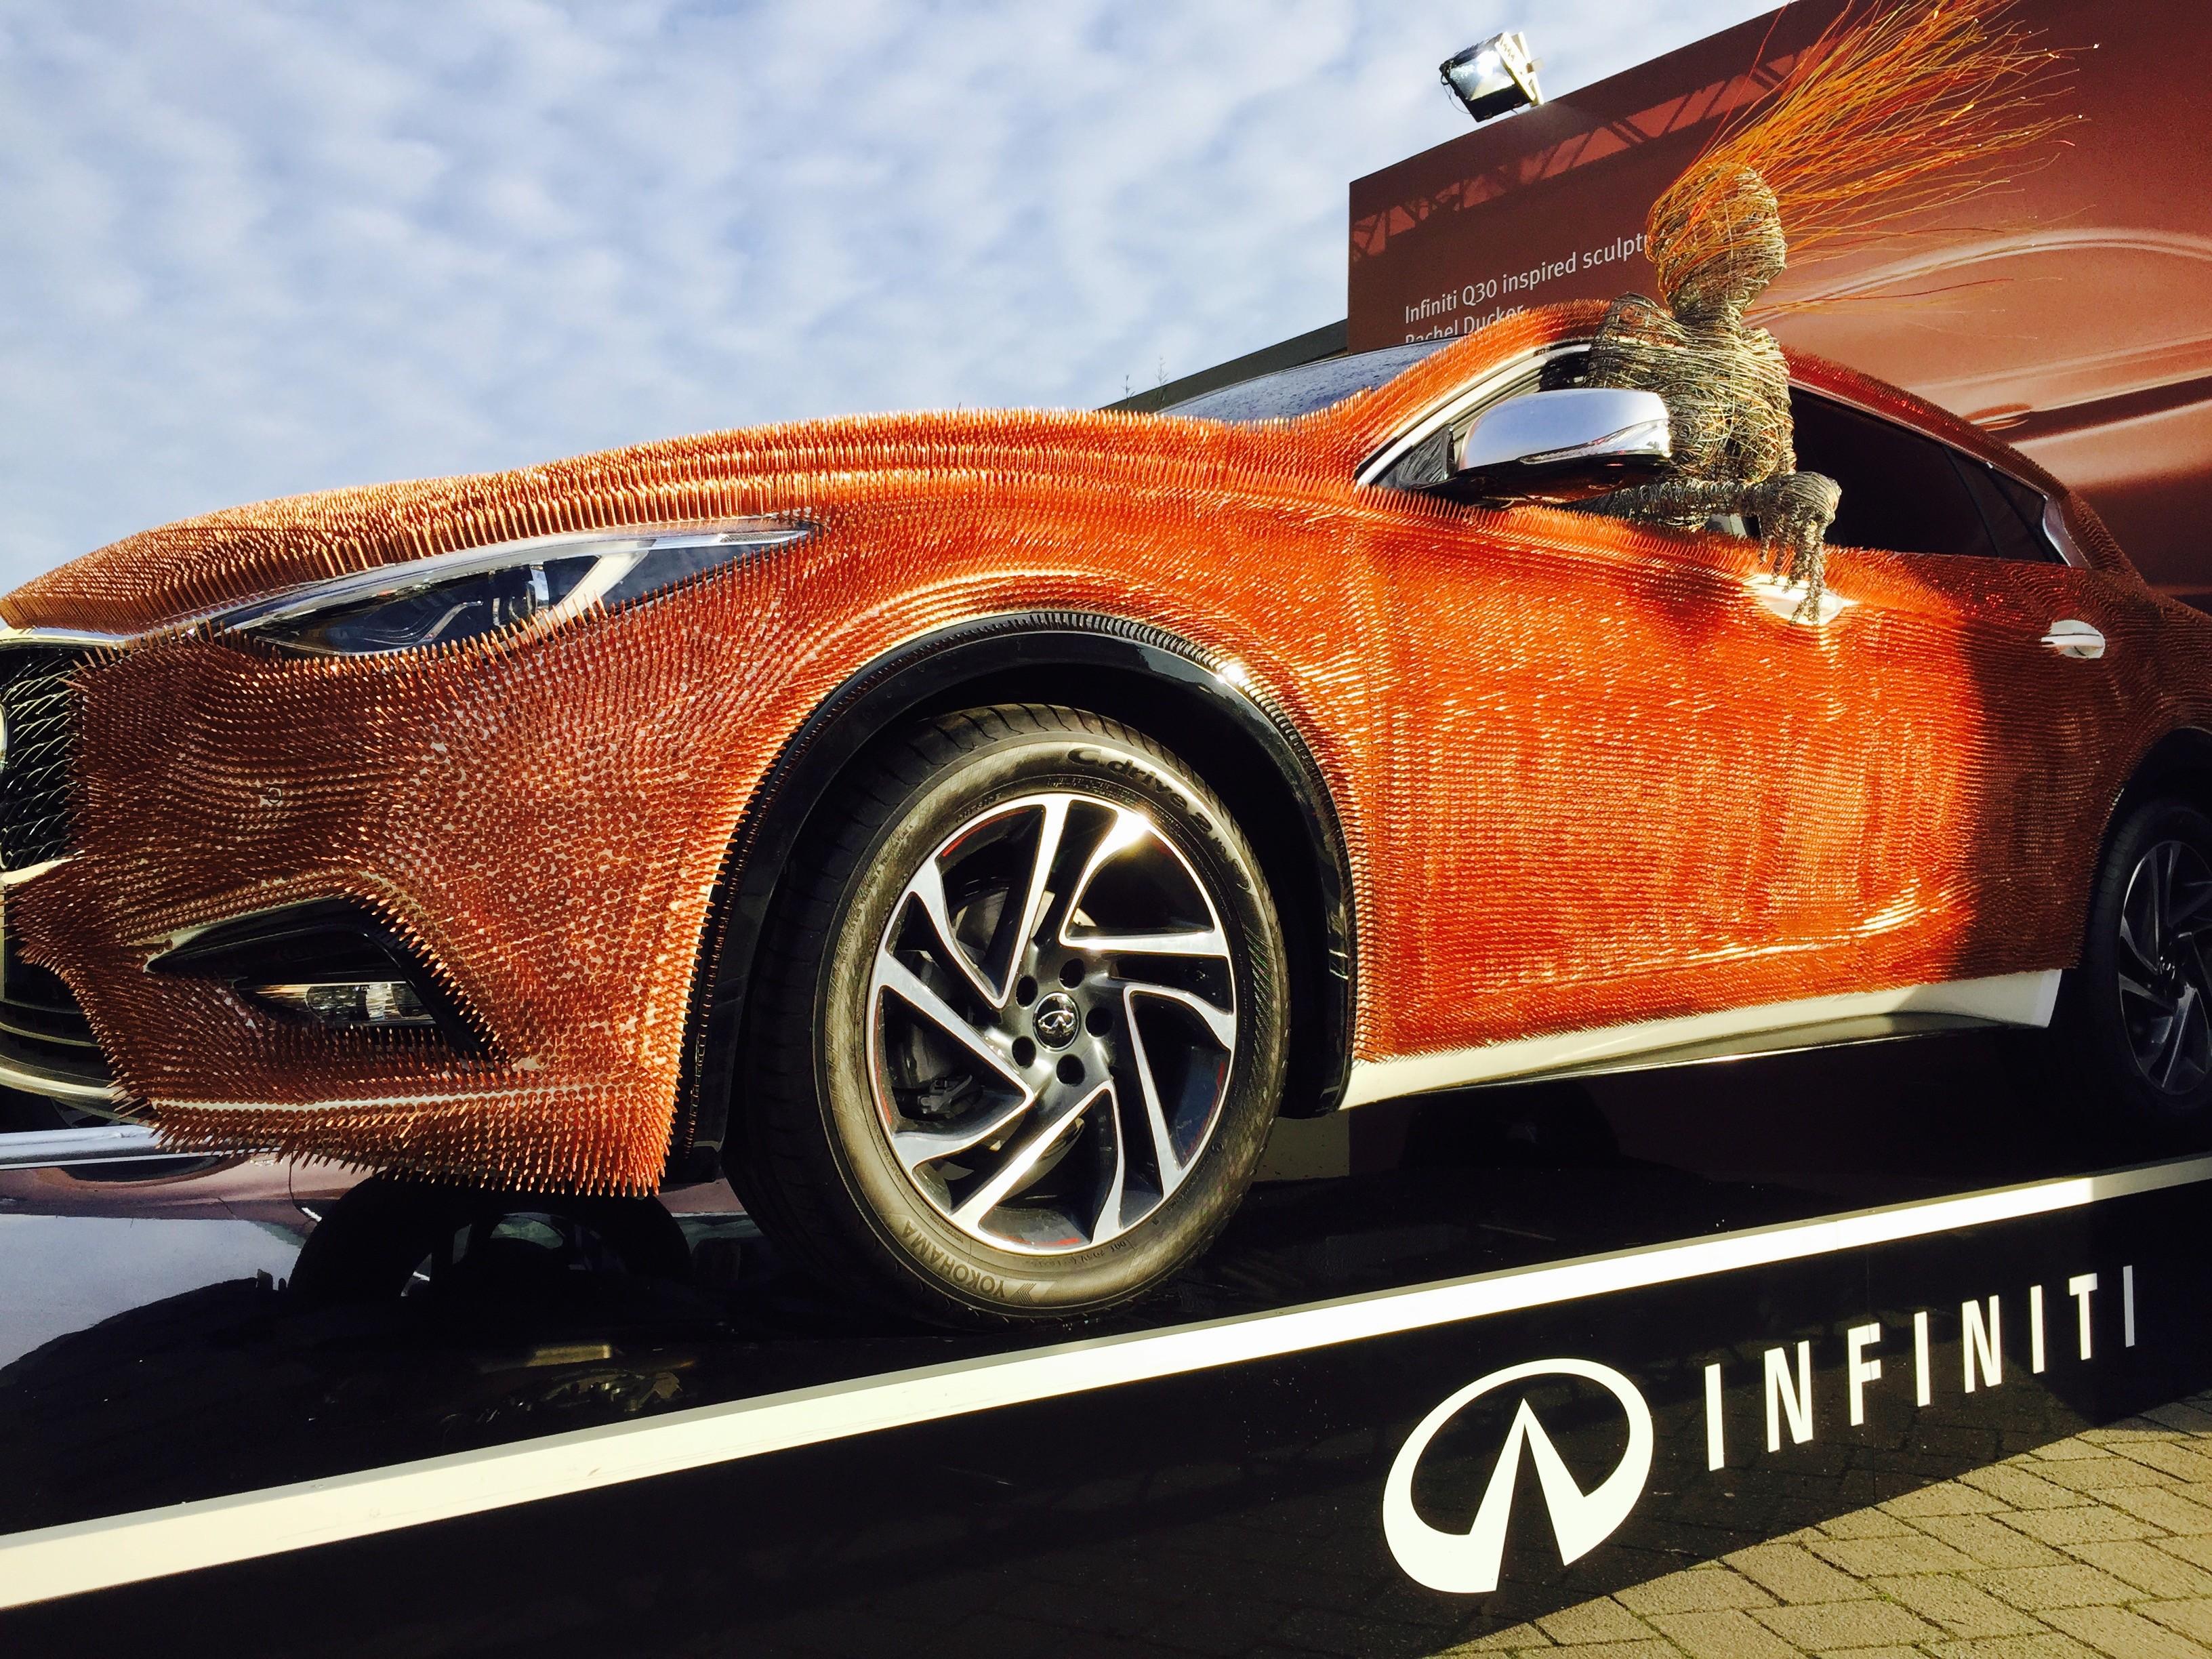 infiniti makes an impression at the london art fair with q30 car art autoevolution. Black Bedroom Furniture Sets. Home Design Ideas